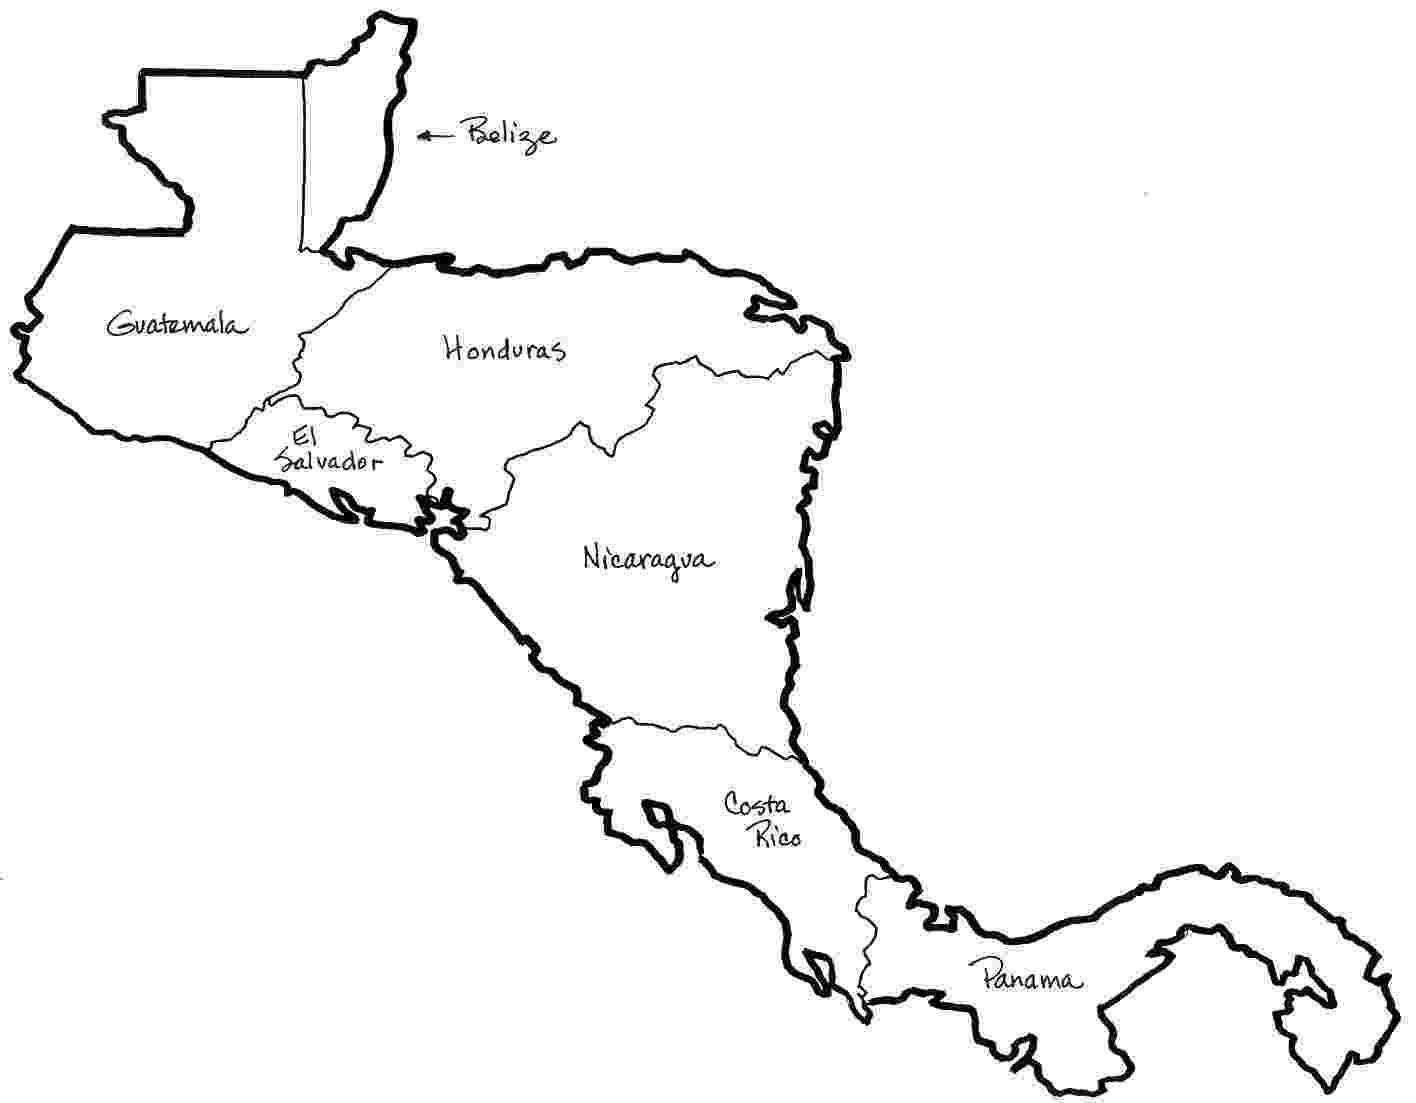 mapa de centroamerica mapa de centroamerica para colorear mapa centroamerica de